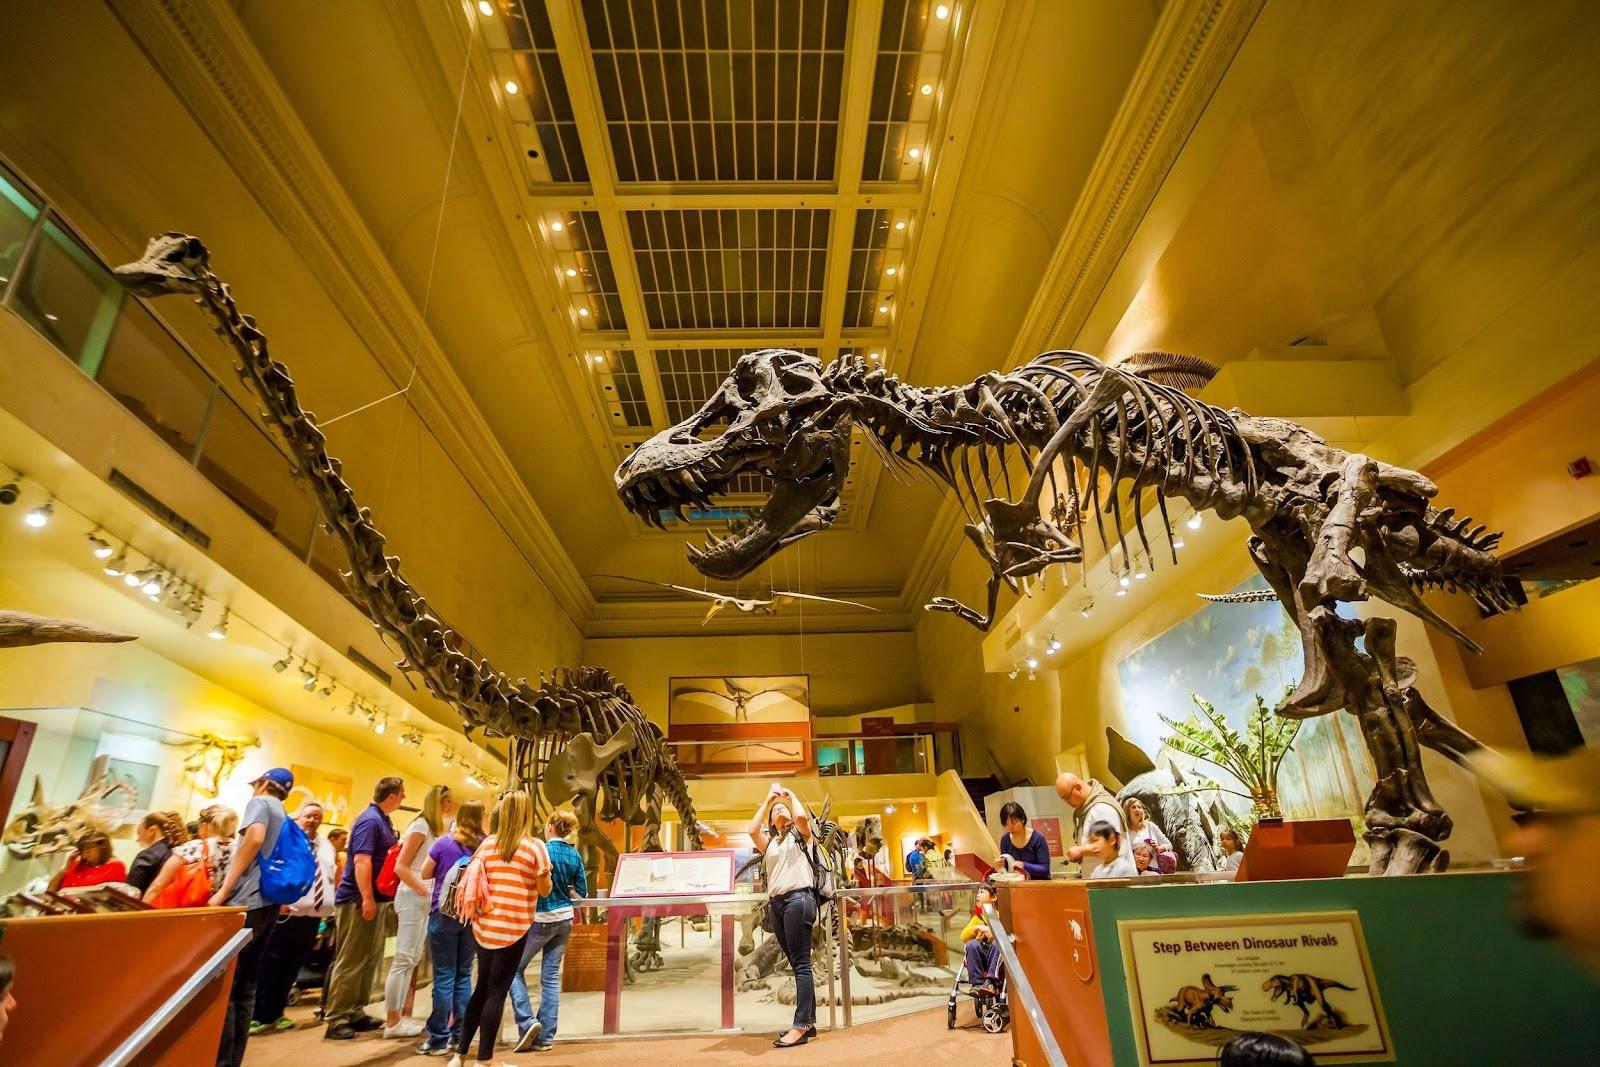 Washington, D.C. museums for kids Smithsonian t-rex replica